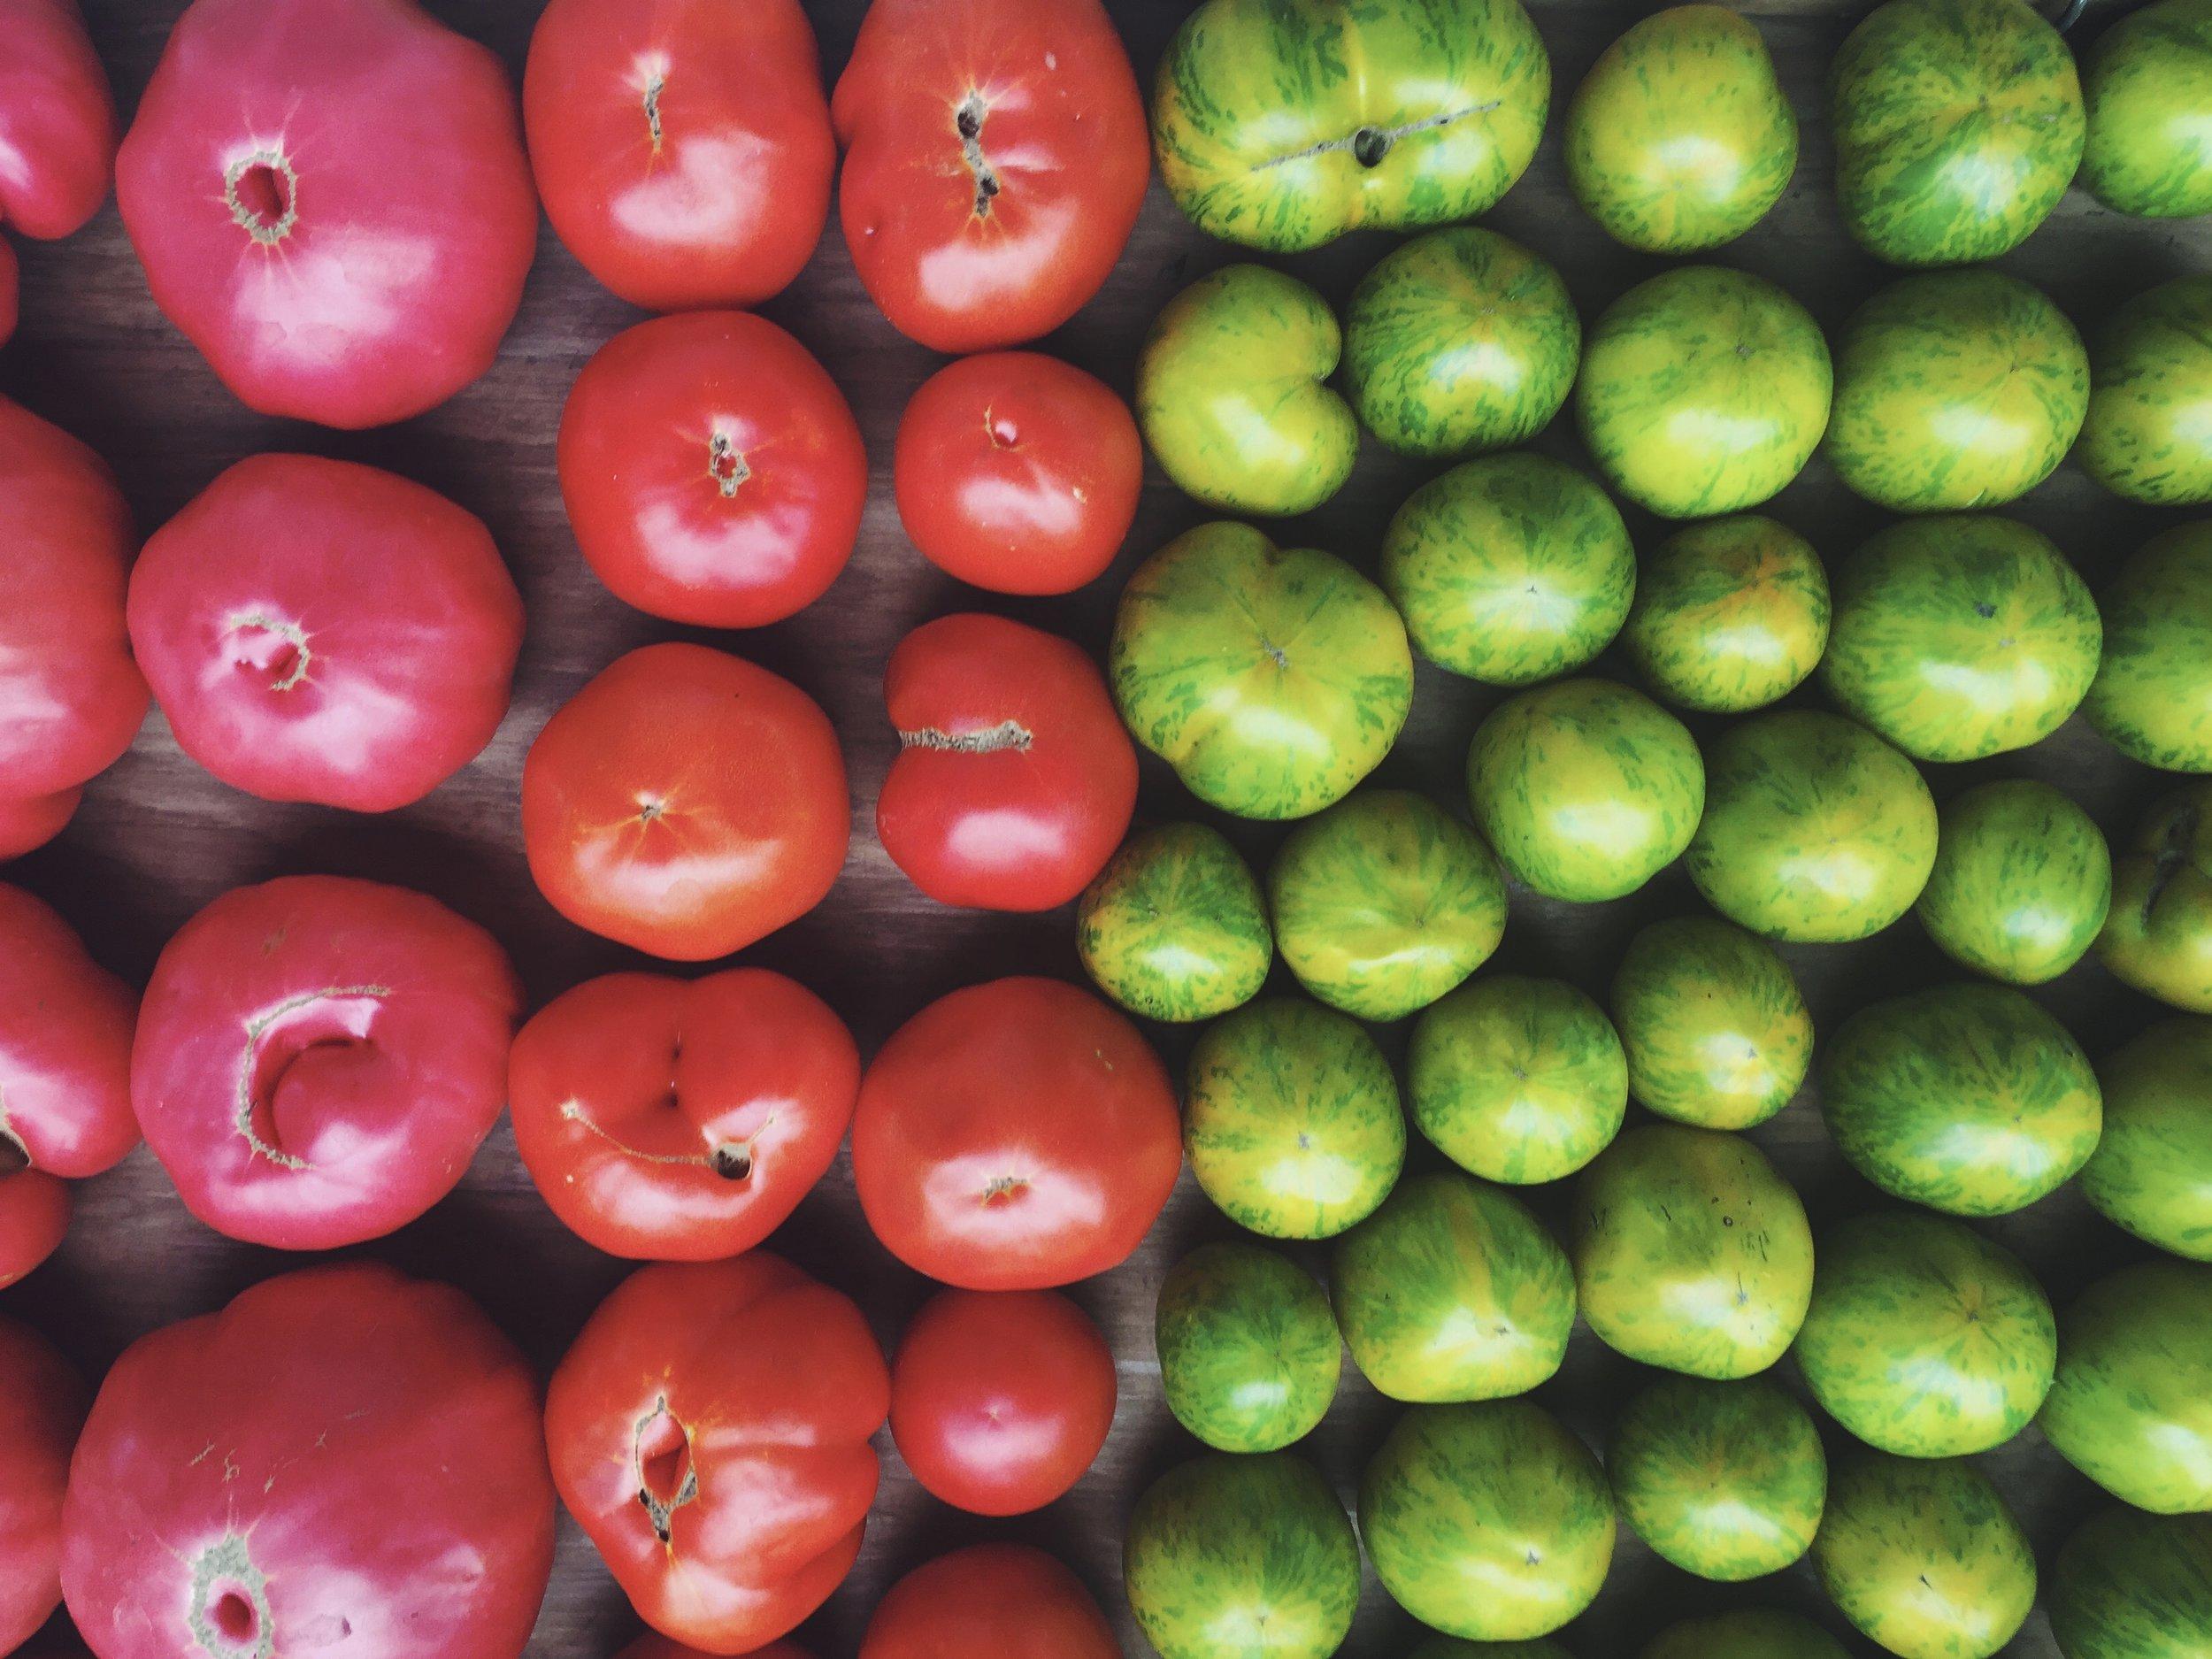 It's tomato season y'all...